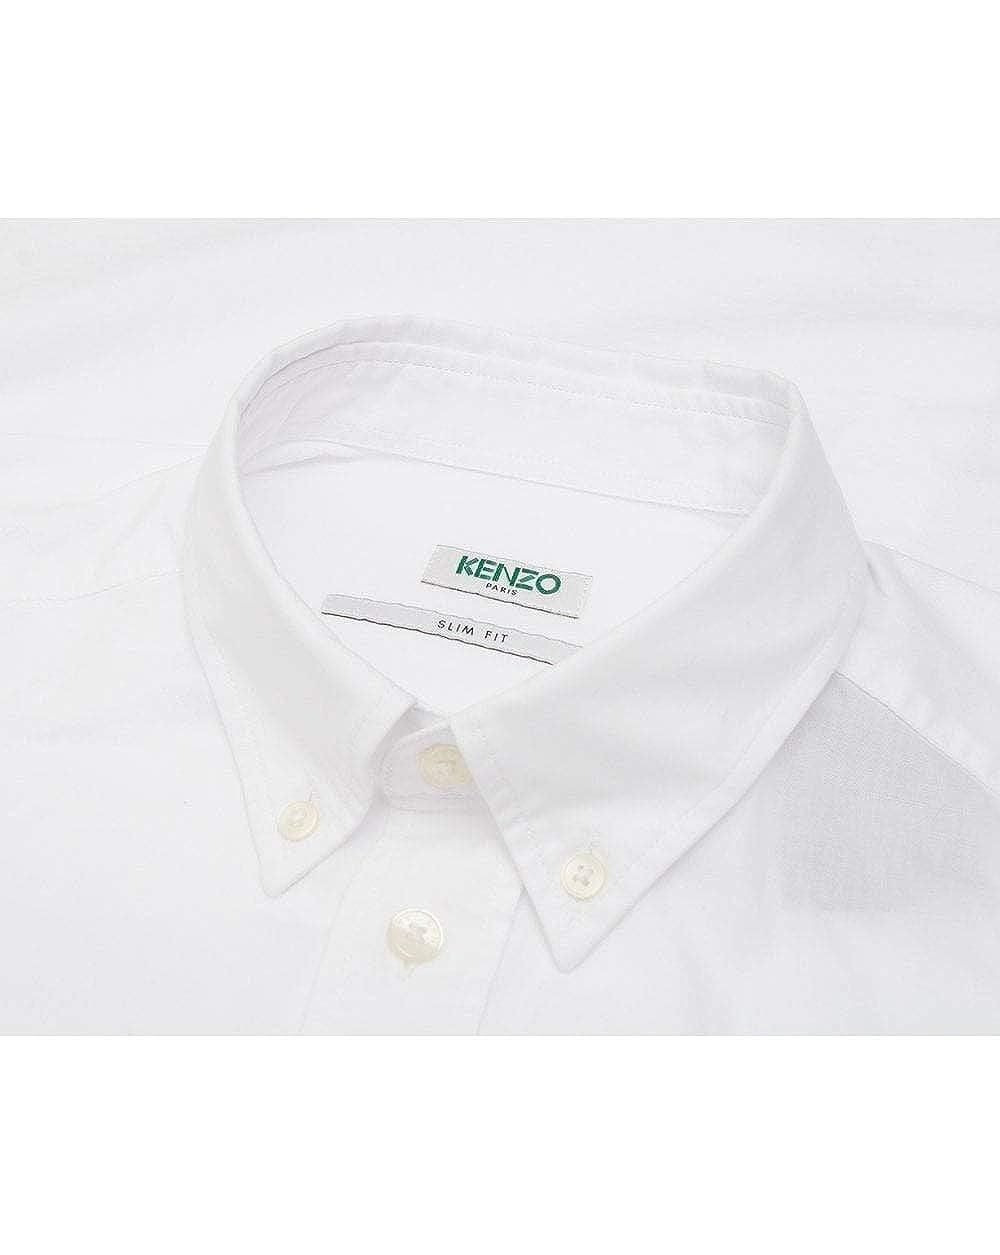 ceae1949 Kenzo Mens Eye Crest Slim Fit White Shirt at Amazon Men's Clothing store: